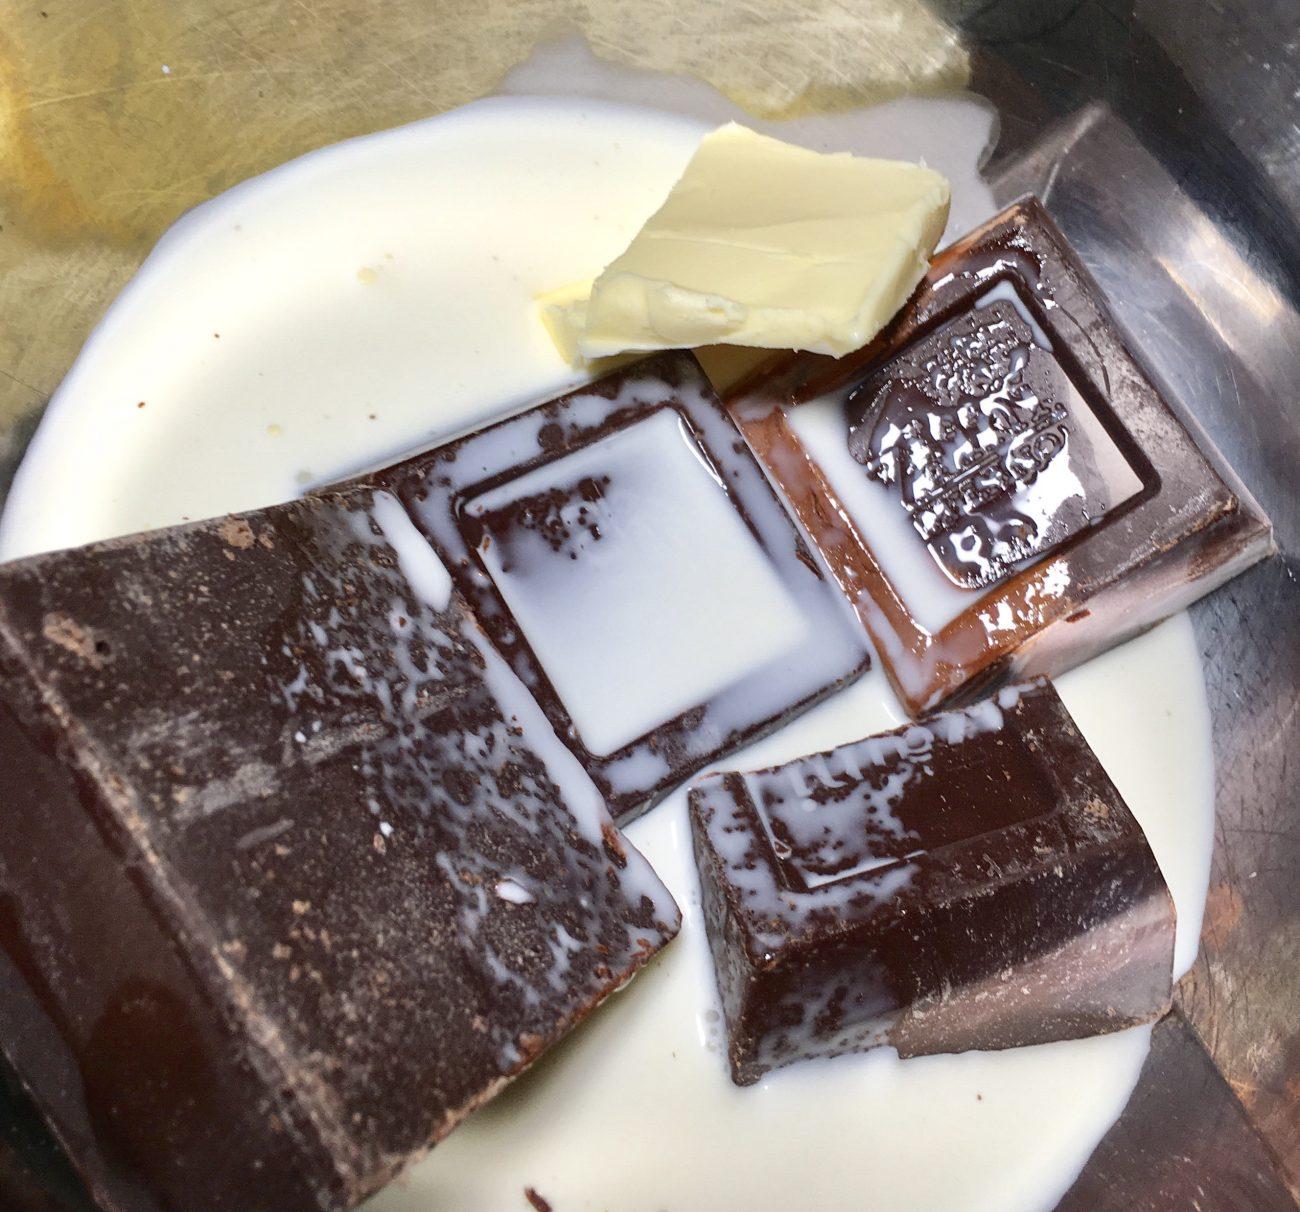 Chocolate salami - SooFoodies